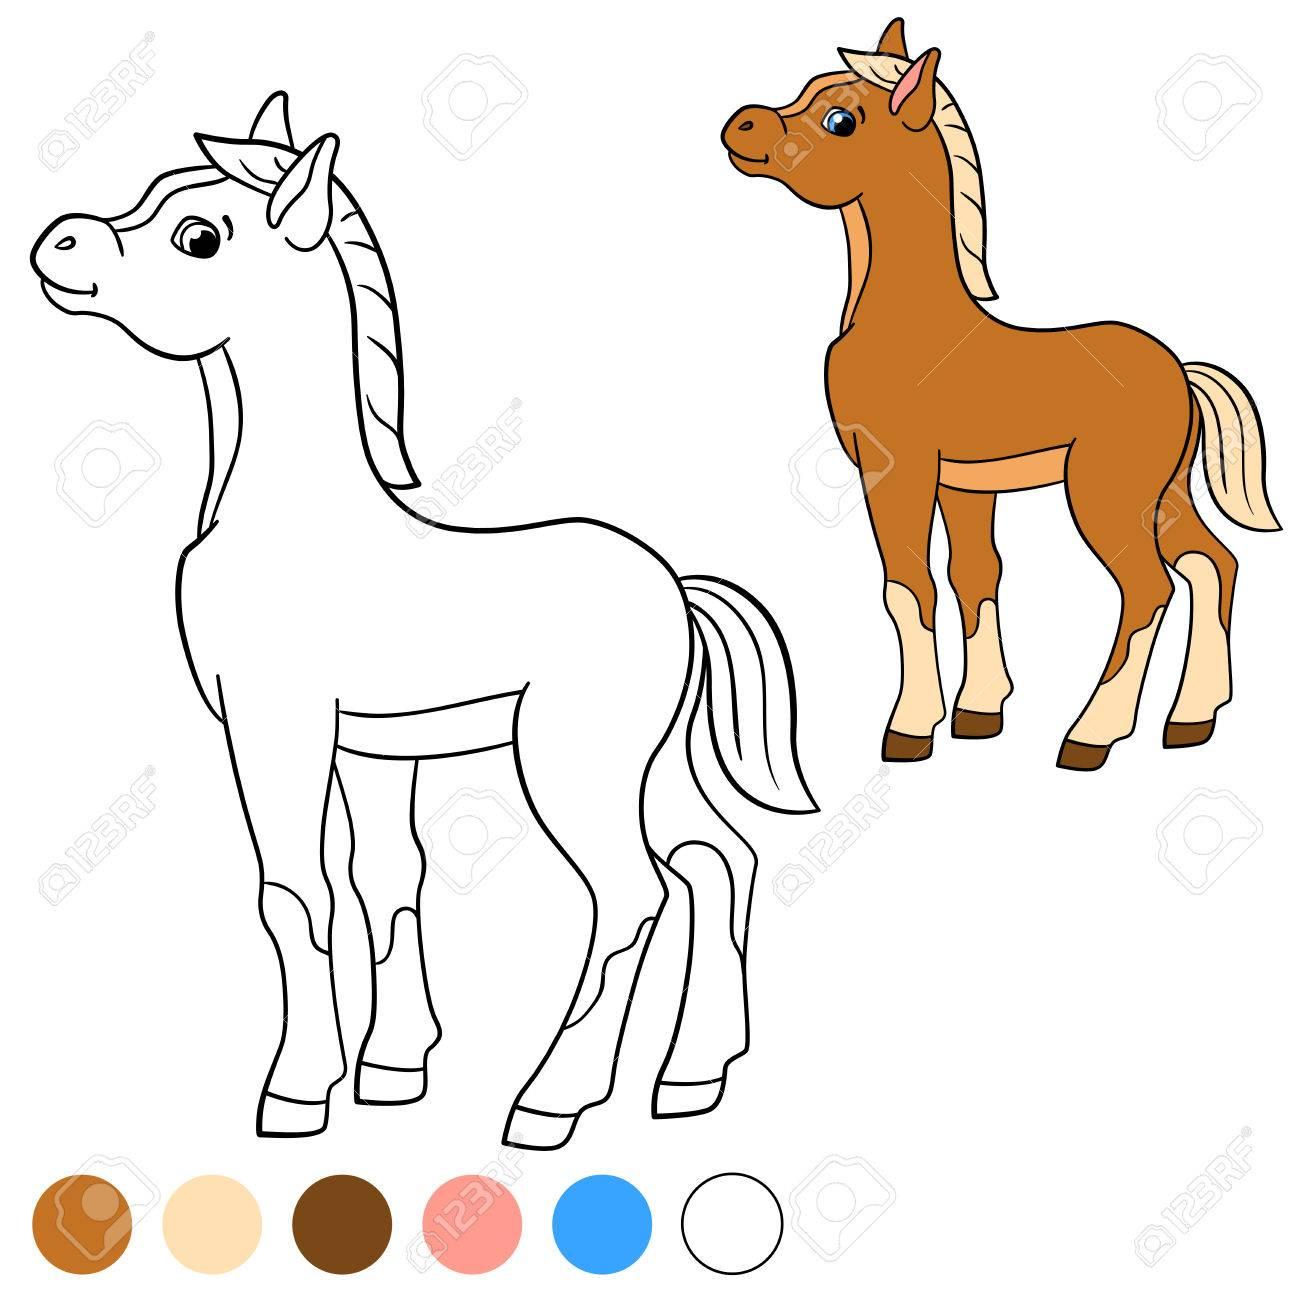 Dibujo Para Colorear. Color Me: Caballo. Poco Pare Linda Sonríe ...